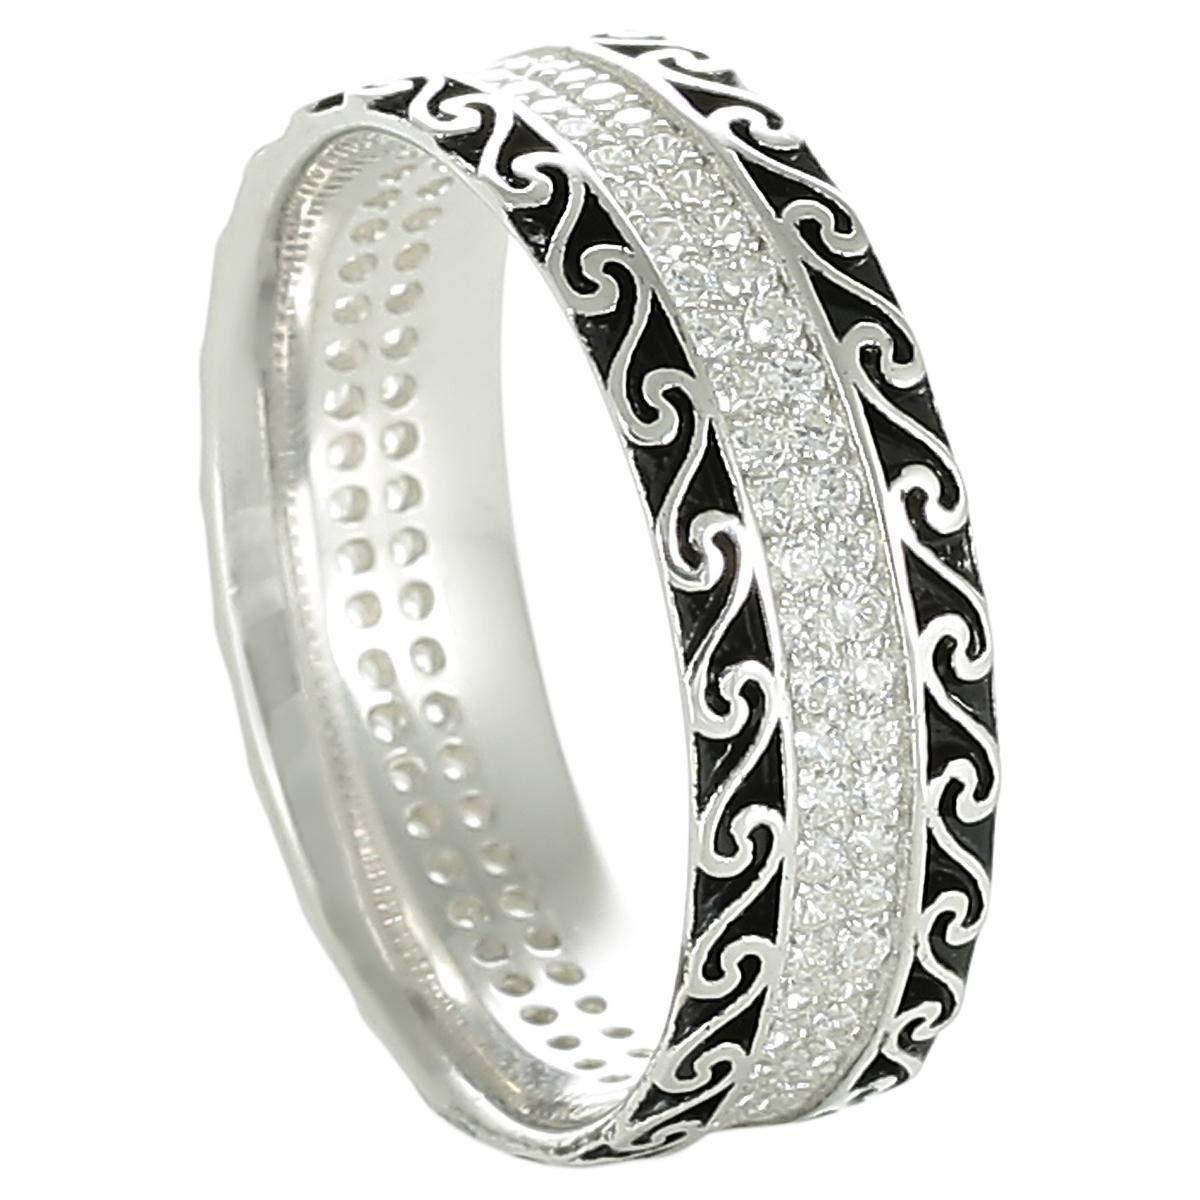 Women's Dibla Ring - Size